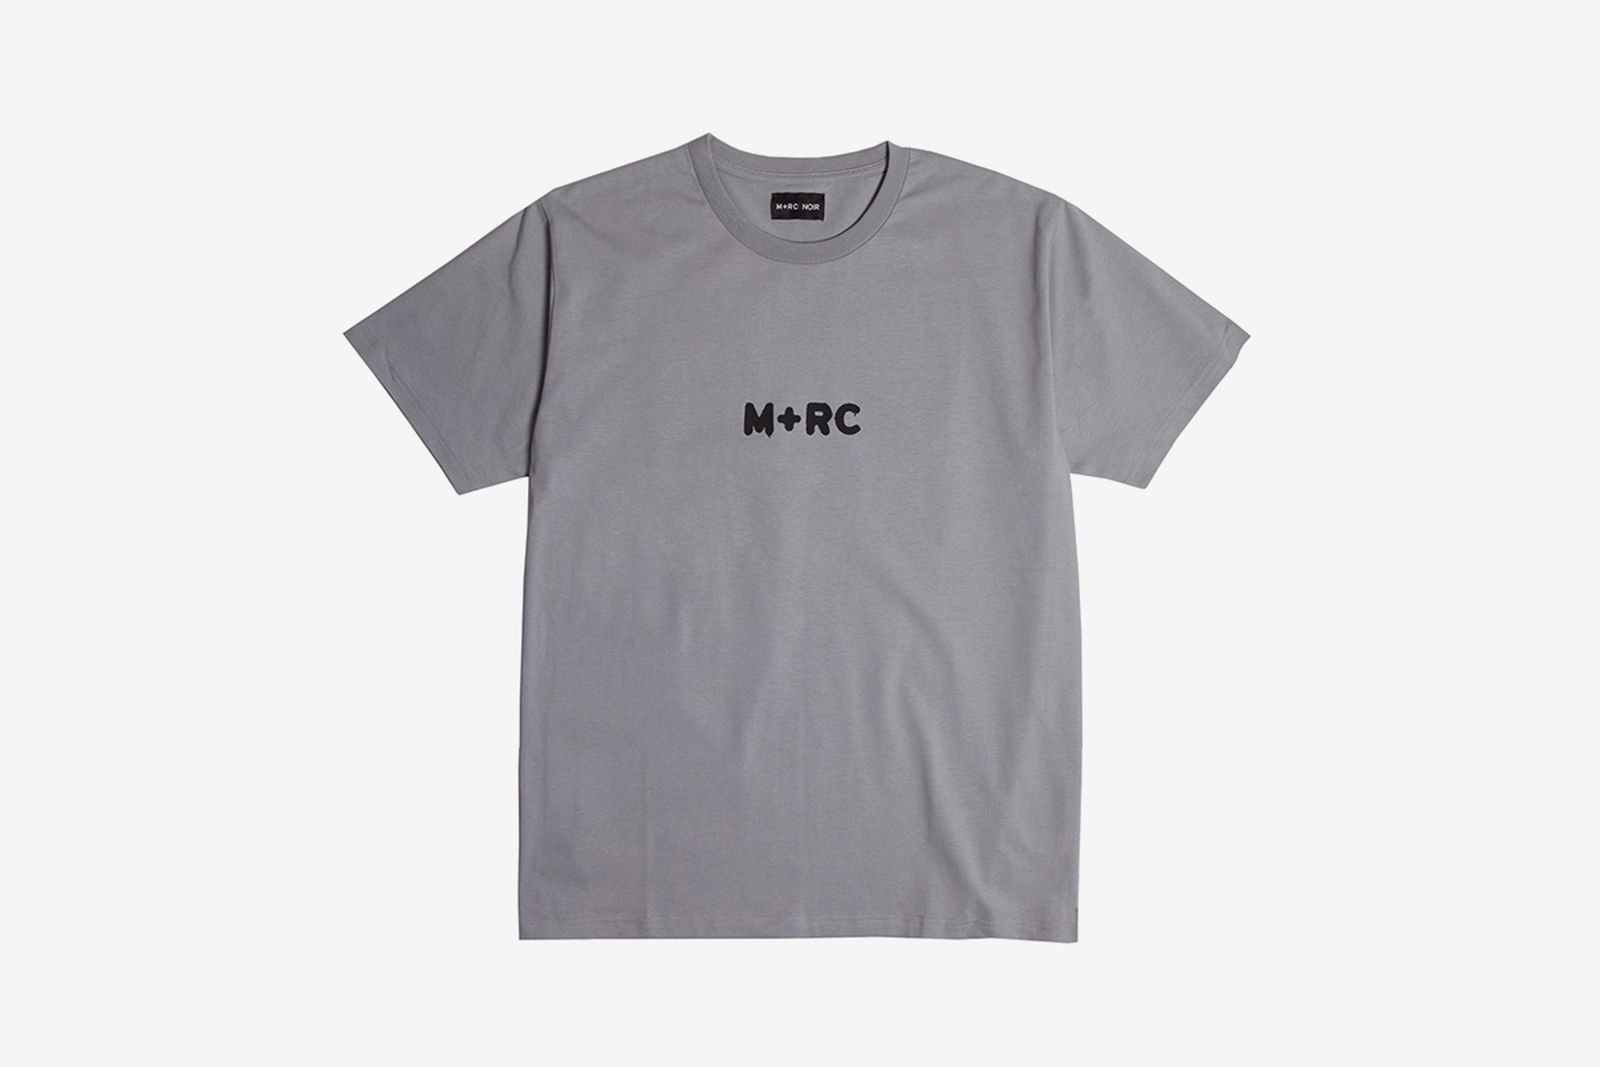 tee shirt big m grey front M RC 2048x2048 M+RC NOIR SS18 playboi carti